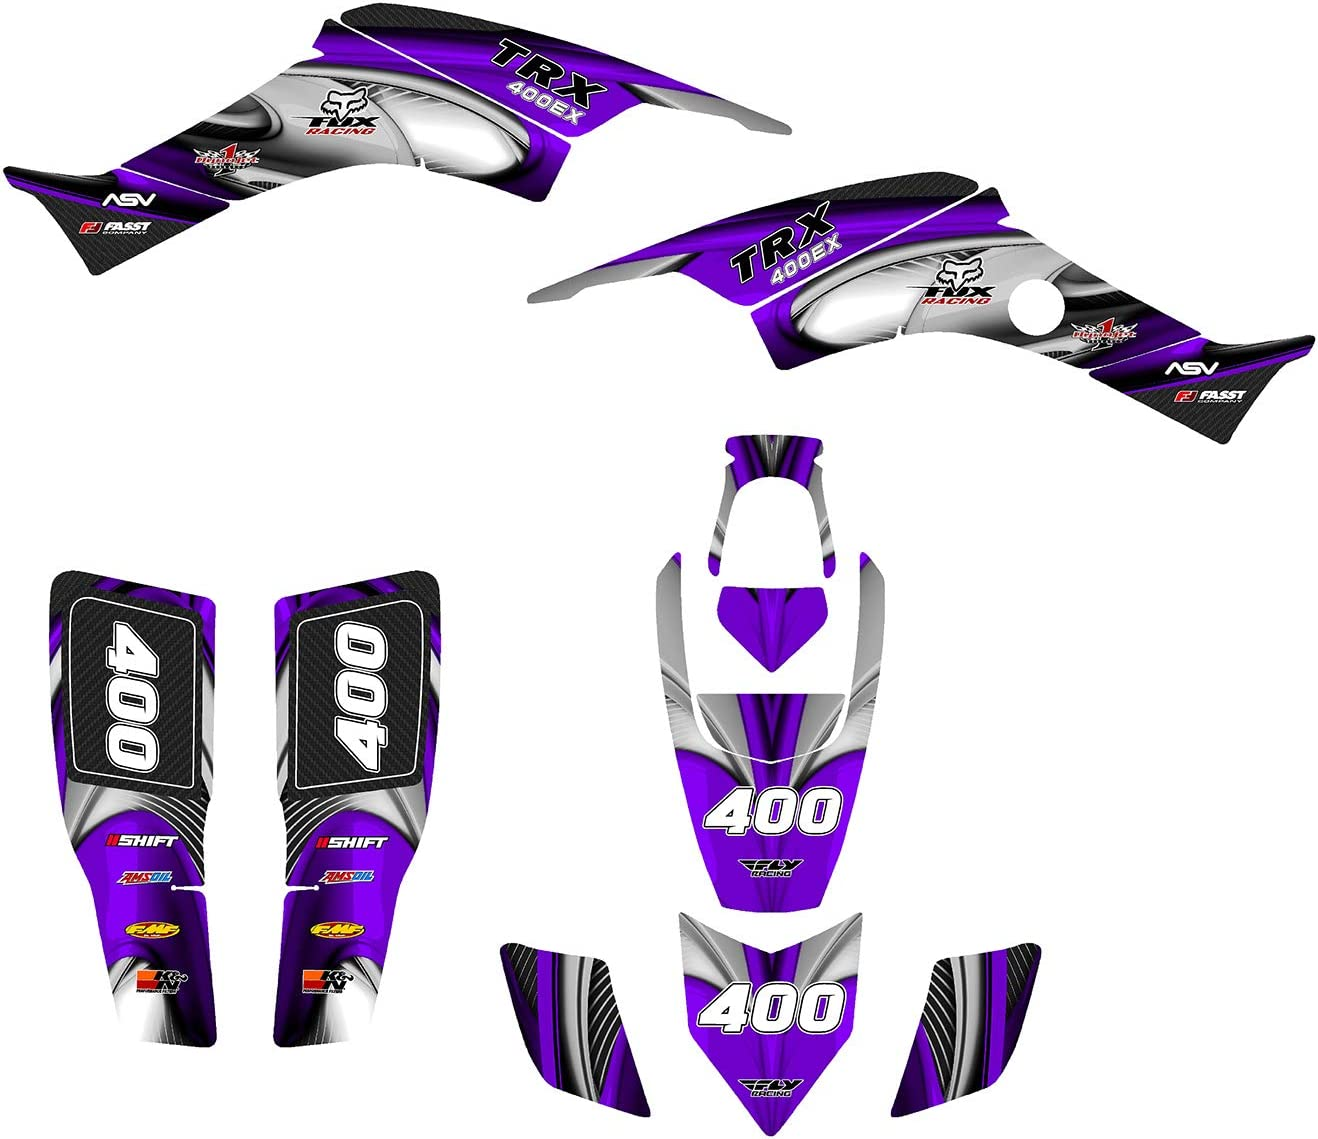 Blue TRX 400 EX graphics wrap kit by AMG fit 1999-2007 design #3737